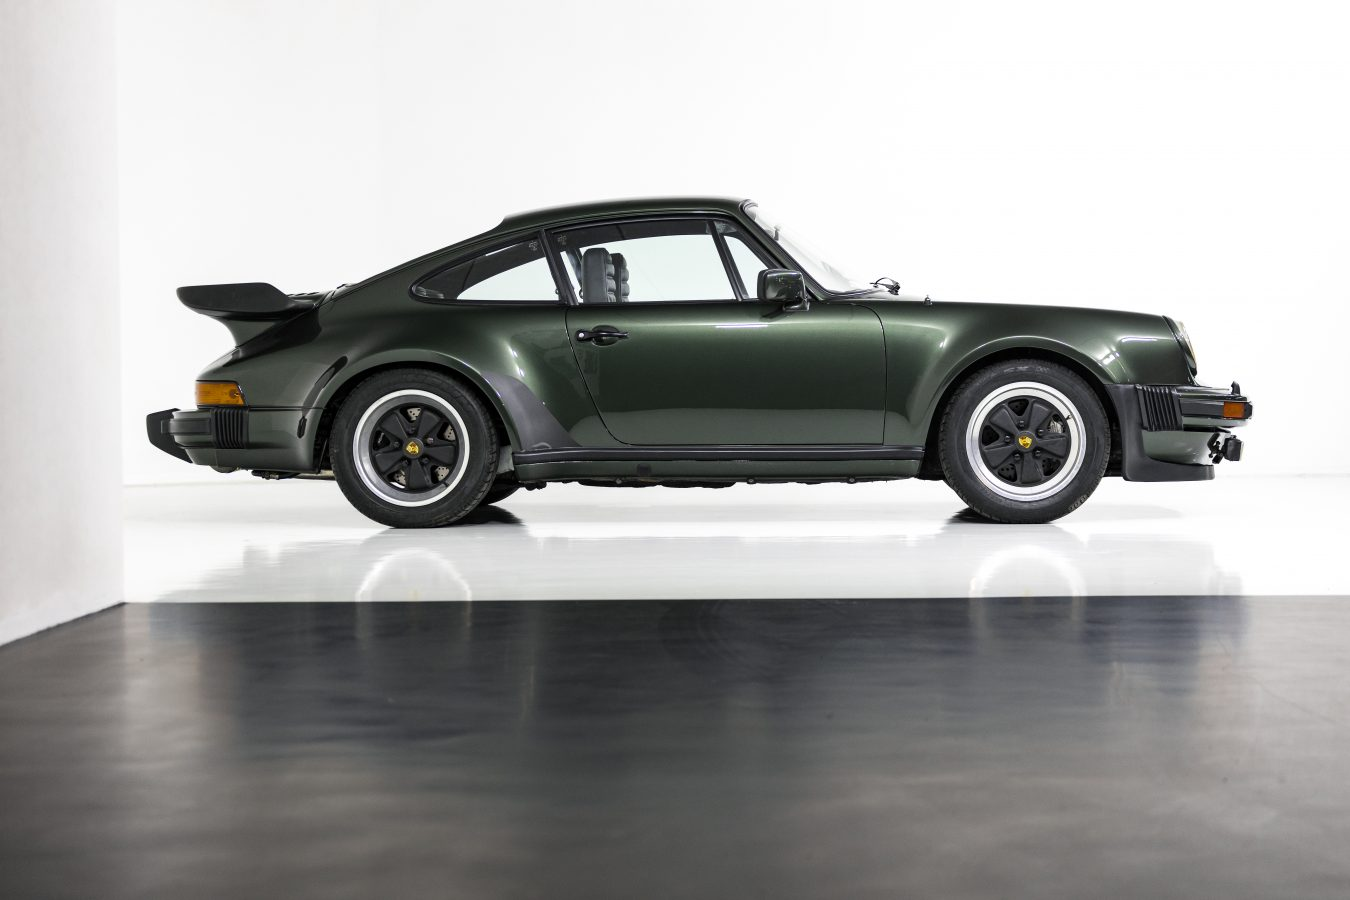 Porsche 911 Turbo 16